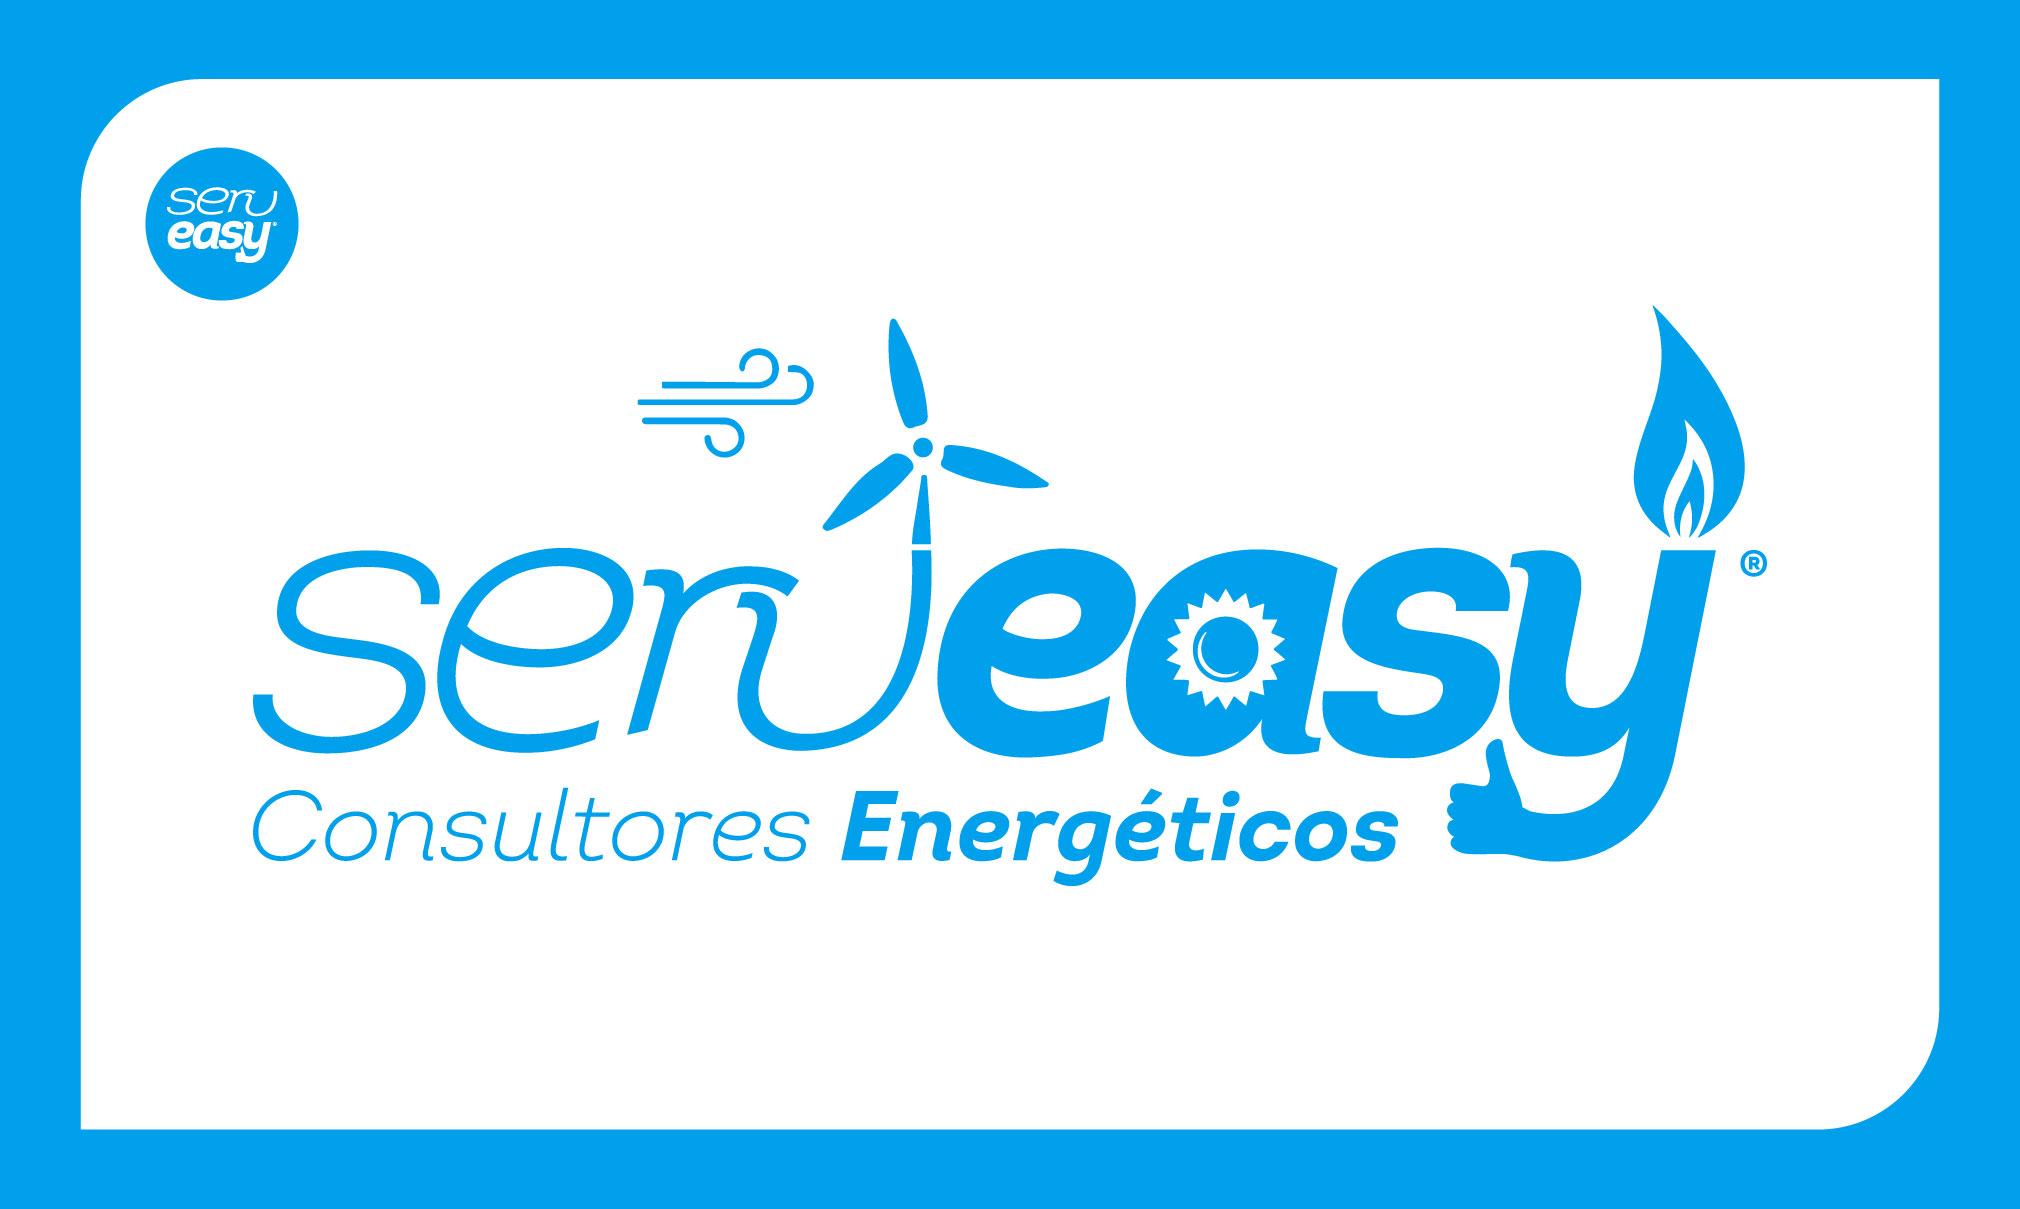 consultores energéticos